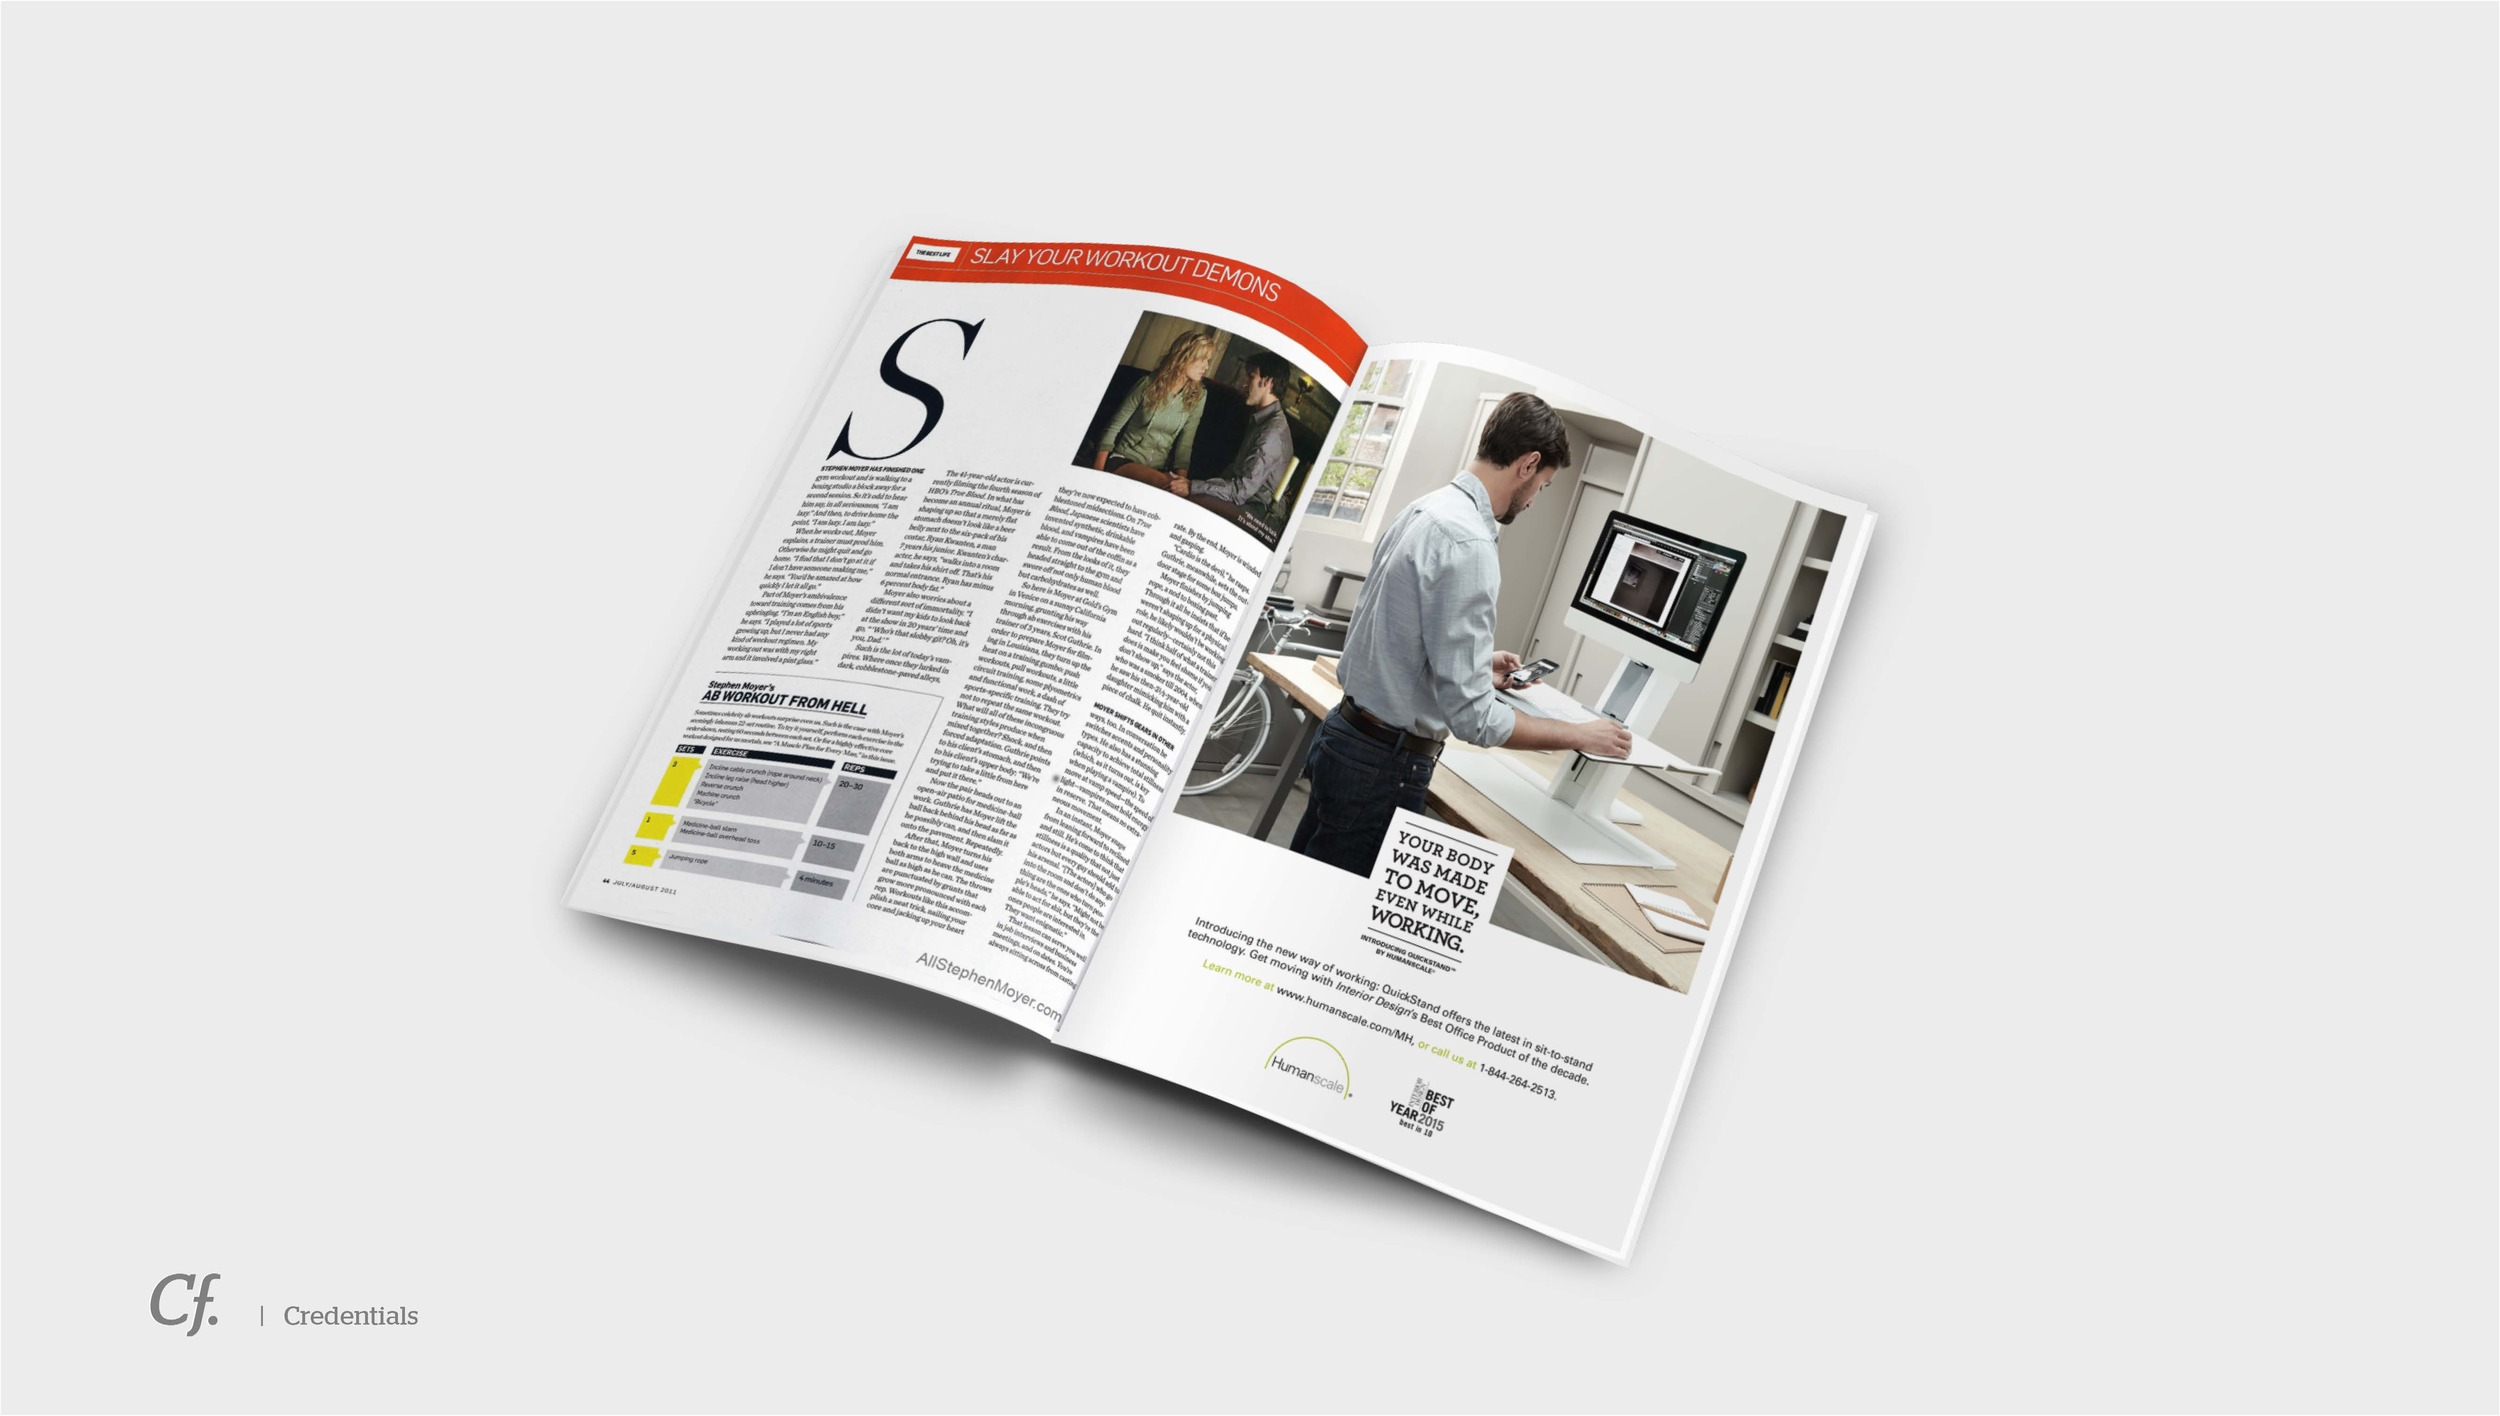 Humanscale-QuickStand-print-ad.jpg